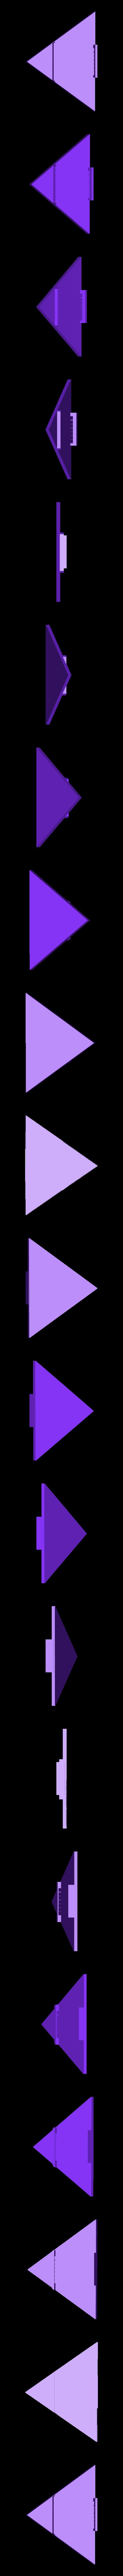 aframe_front1.stl Download free STL file Saxon Burh A frame hut • 3D print object, Earsling